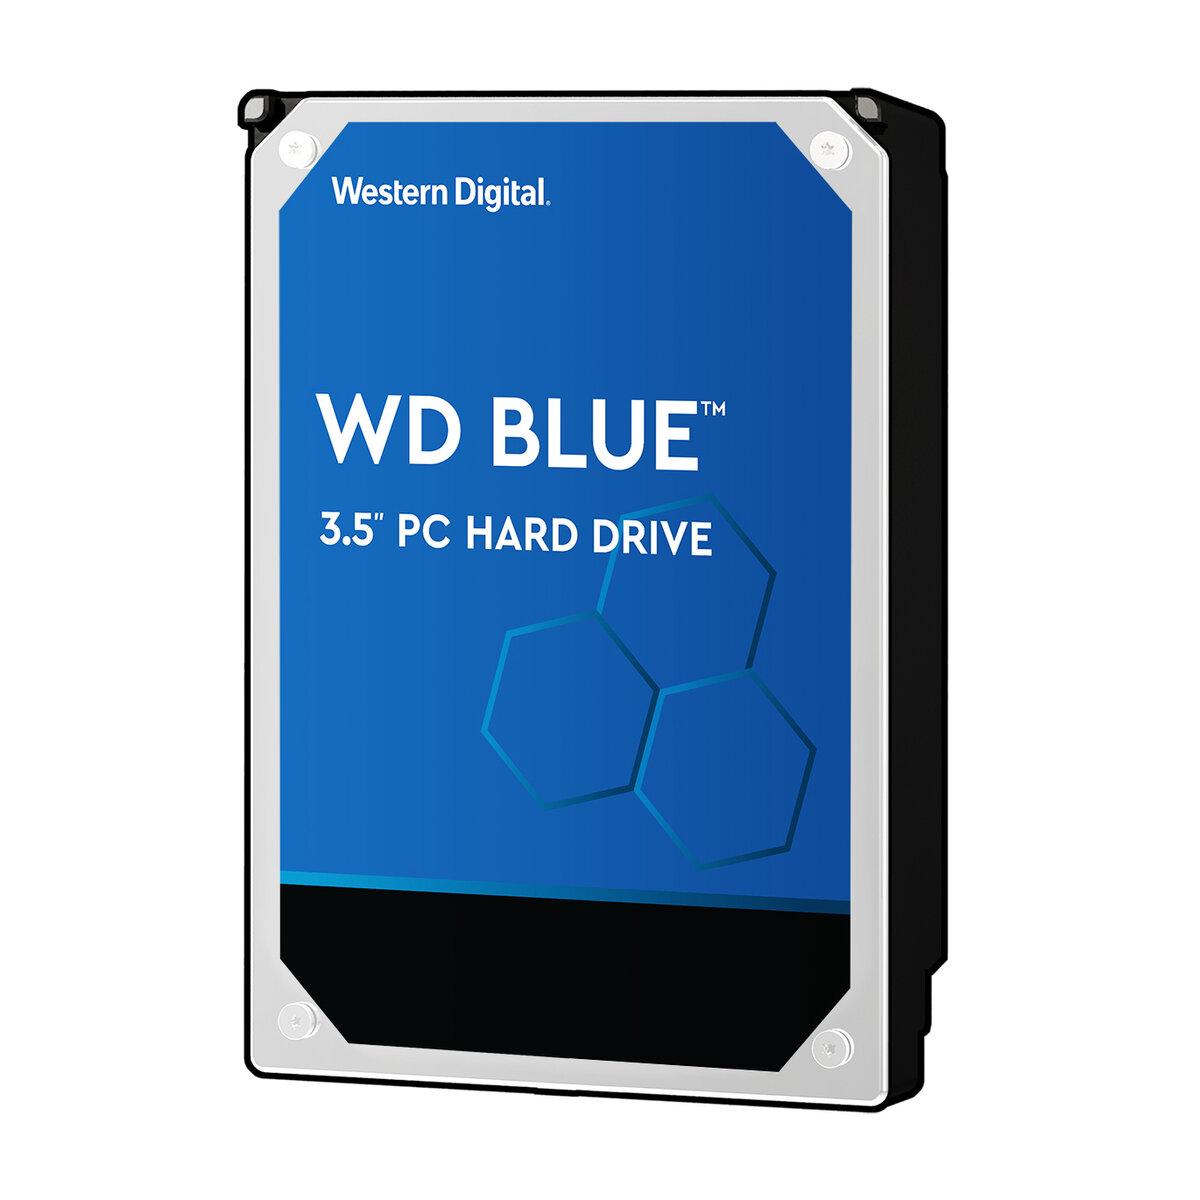 29bd3b4e7b1d WD Blue 3TB Desktop Hard Disk Drive - 5400 RPM SATA 6Gb/s 64MB Cache 3.5  Inch - WD30EZRZ